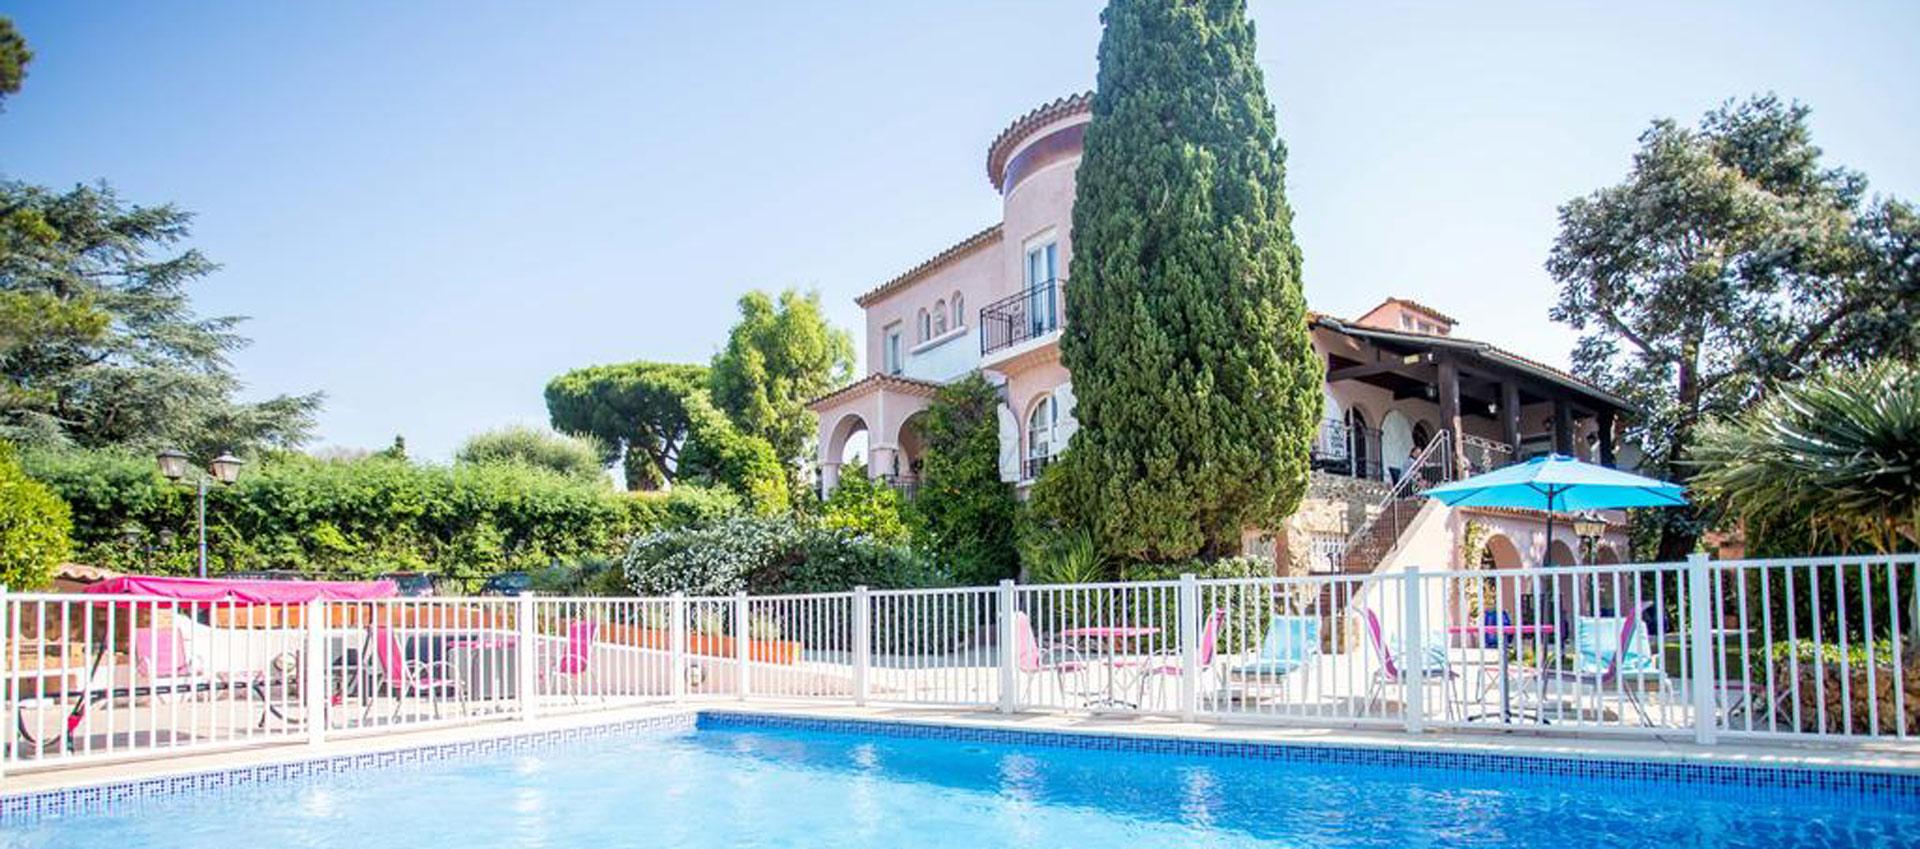 Hotel Villa des Anges 4